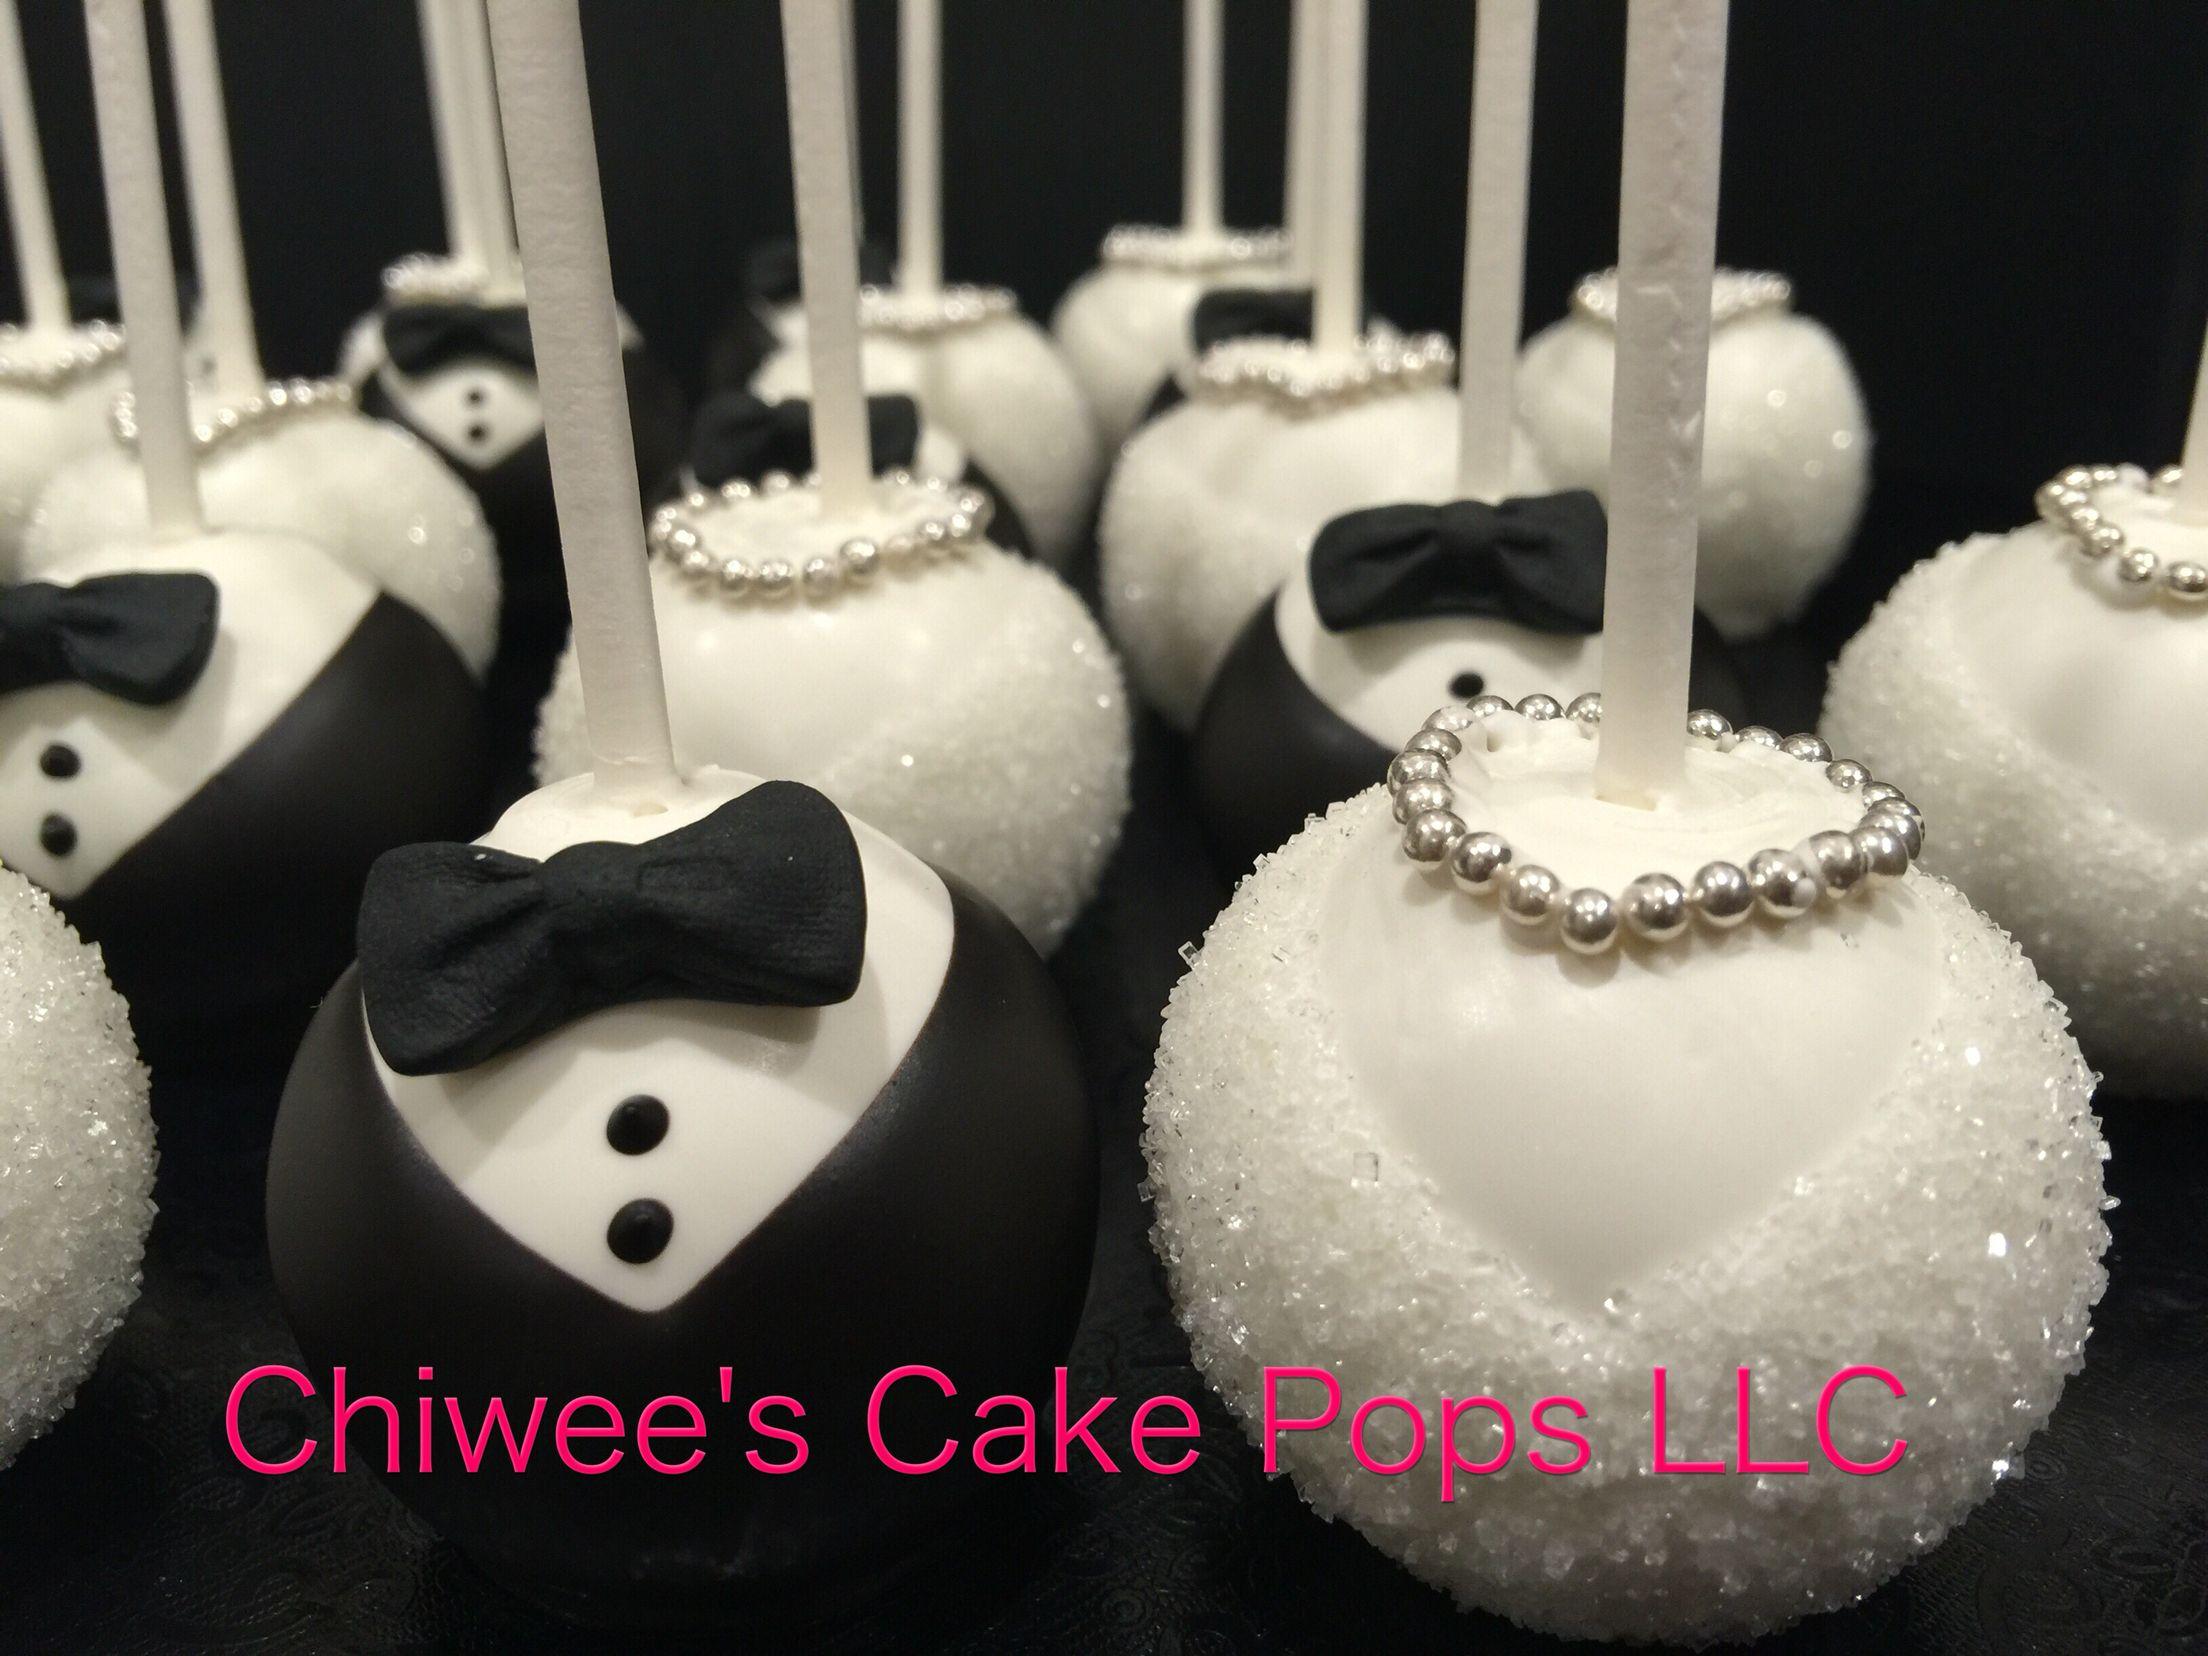 Bride And Groom Cake Pops Wedding Cake Pops Elegant Cake Pops Wedding Cake Pops Favors